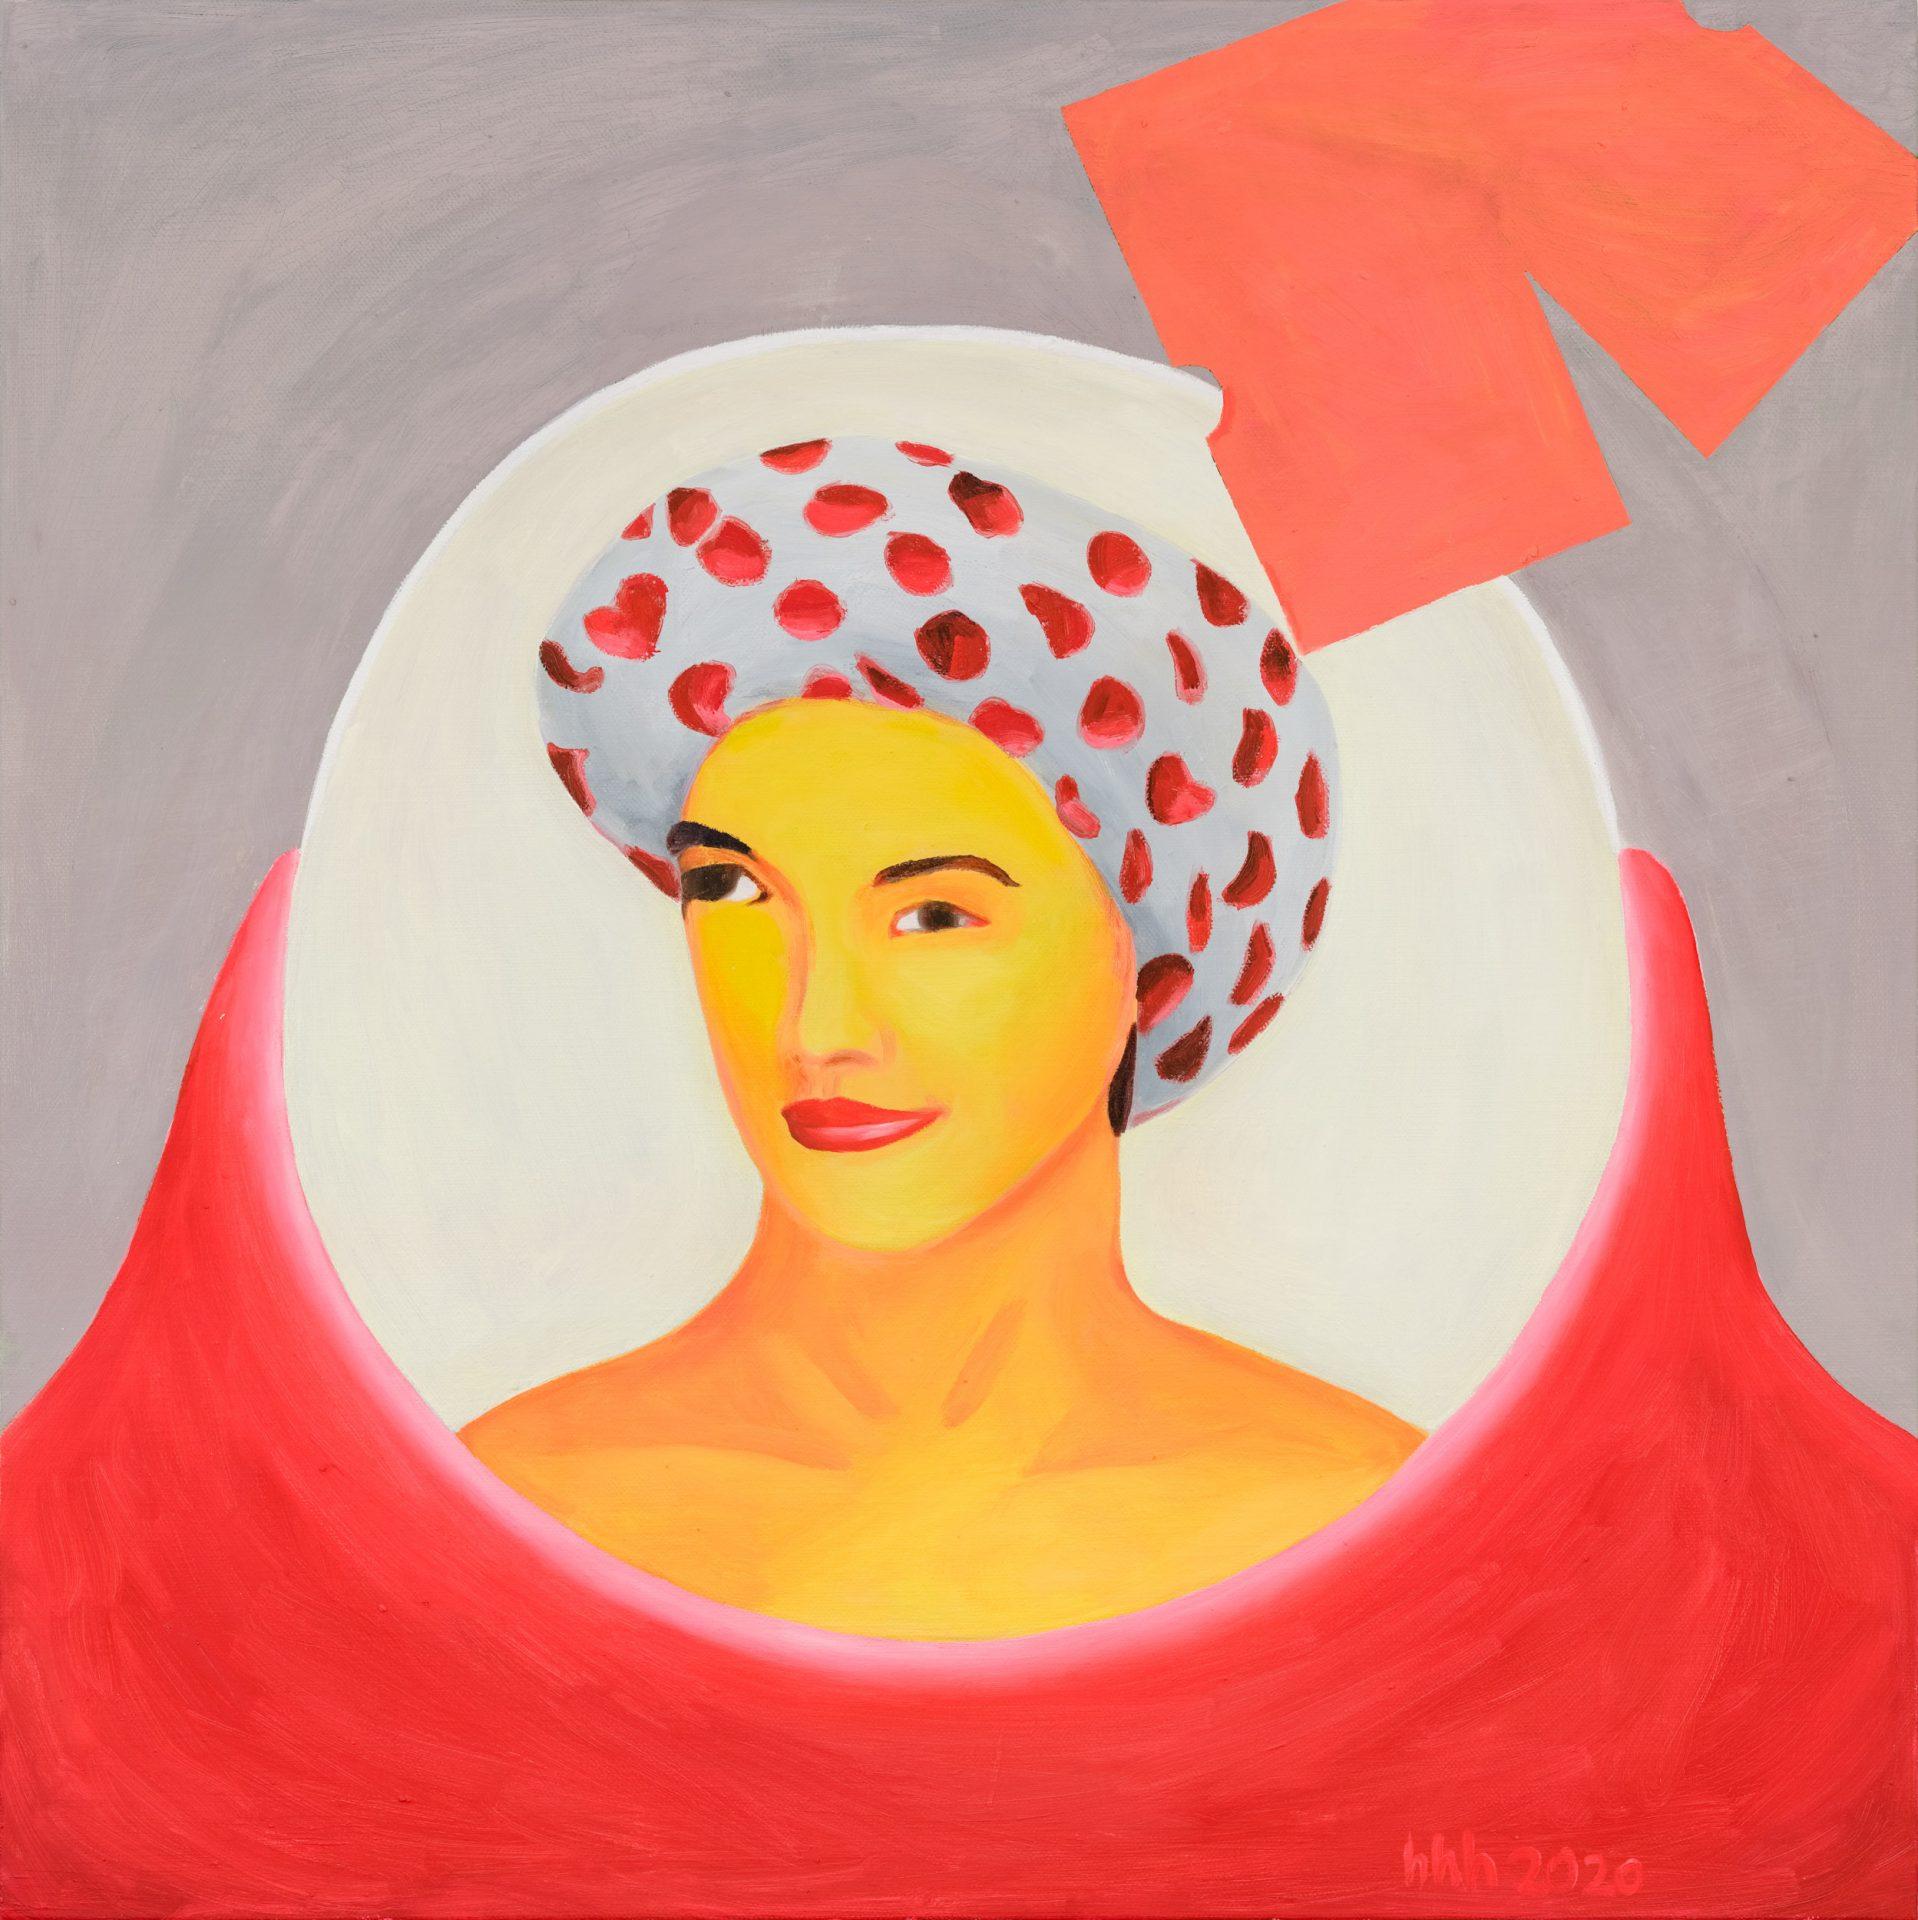 Wu - 黃海欣 Huang HaiHsin, 99美分 #9 99 Cent #9, 2020 畫布油彩 oil on canvas, 75 x 75 cm